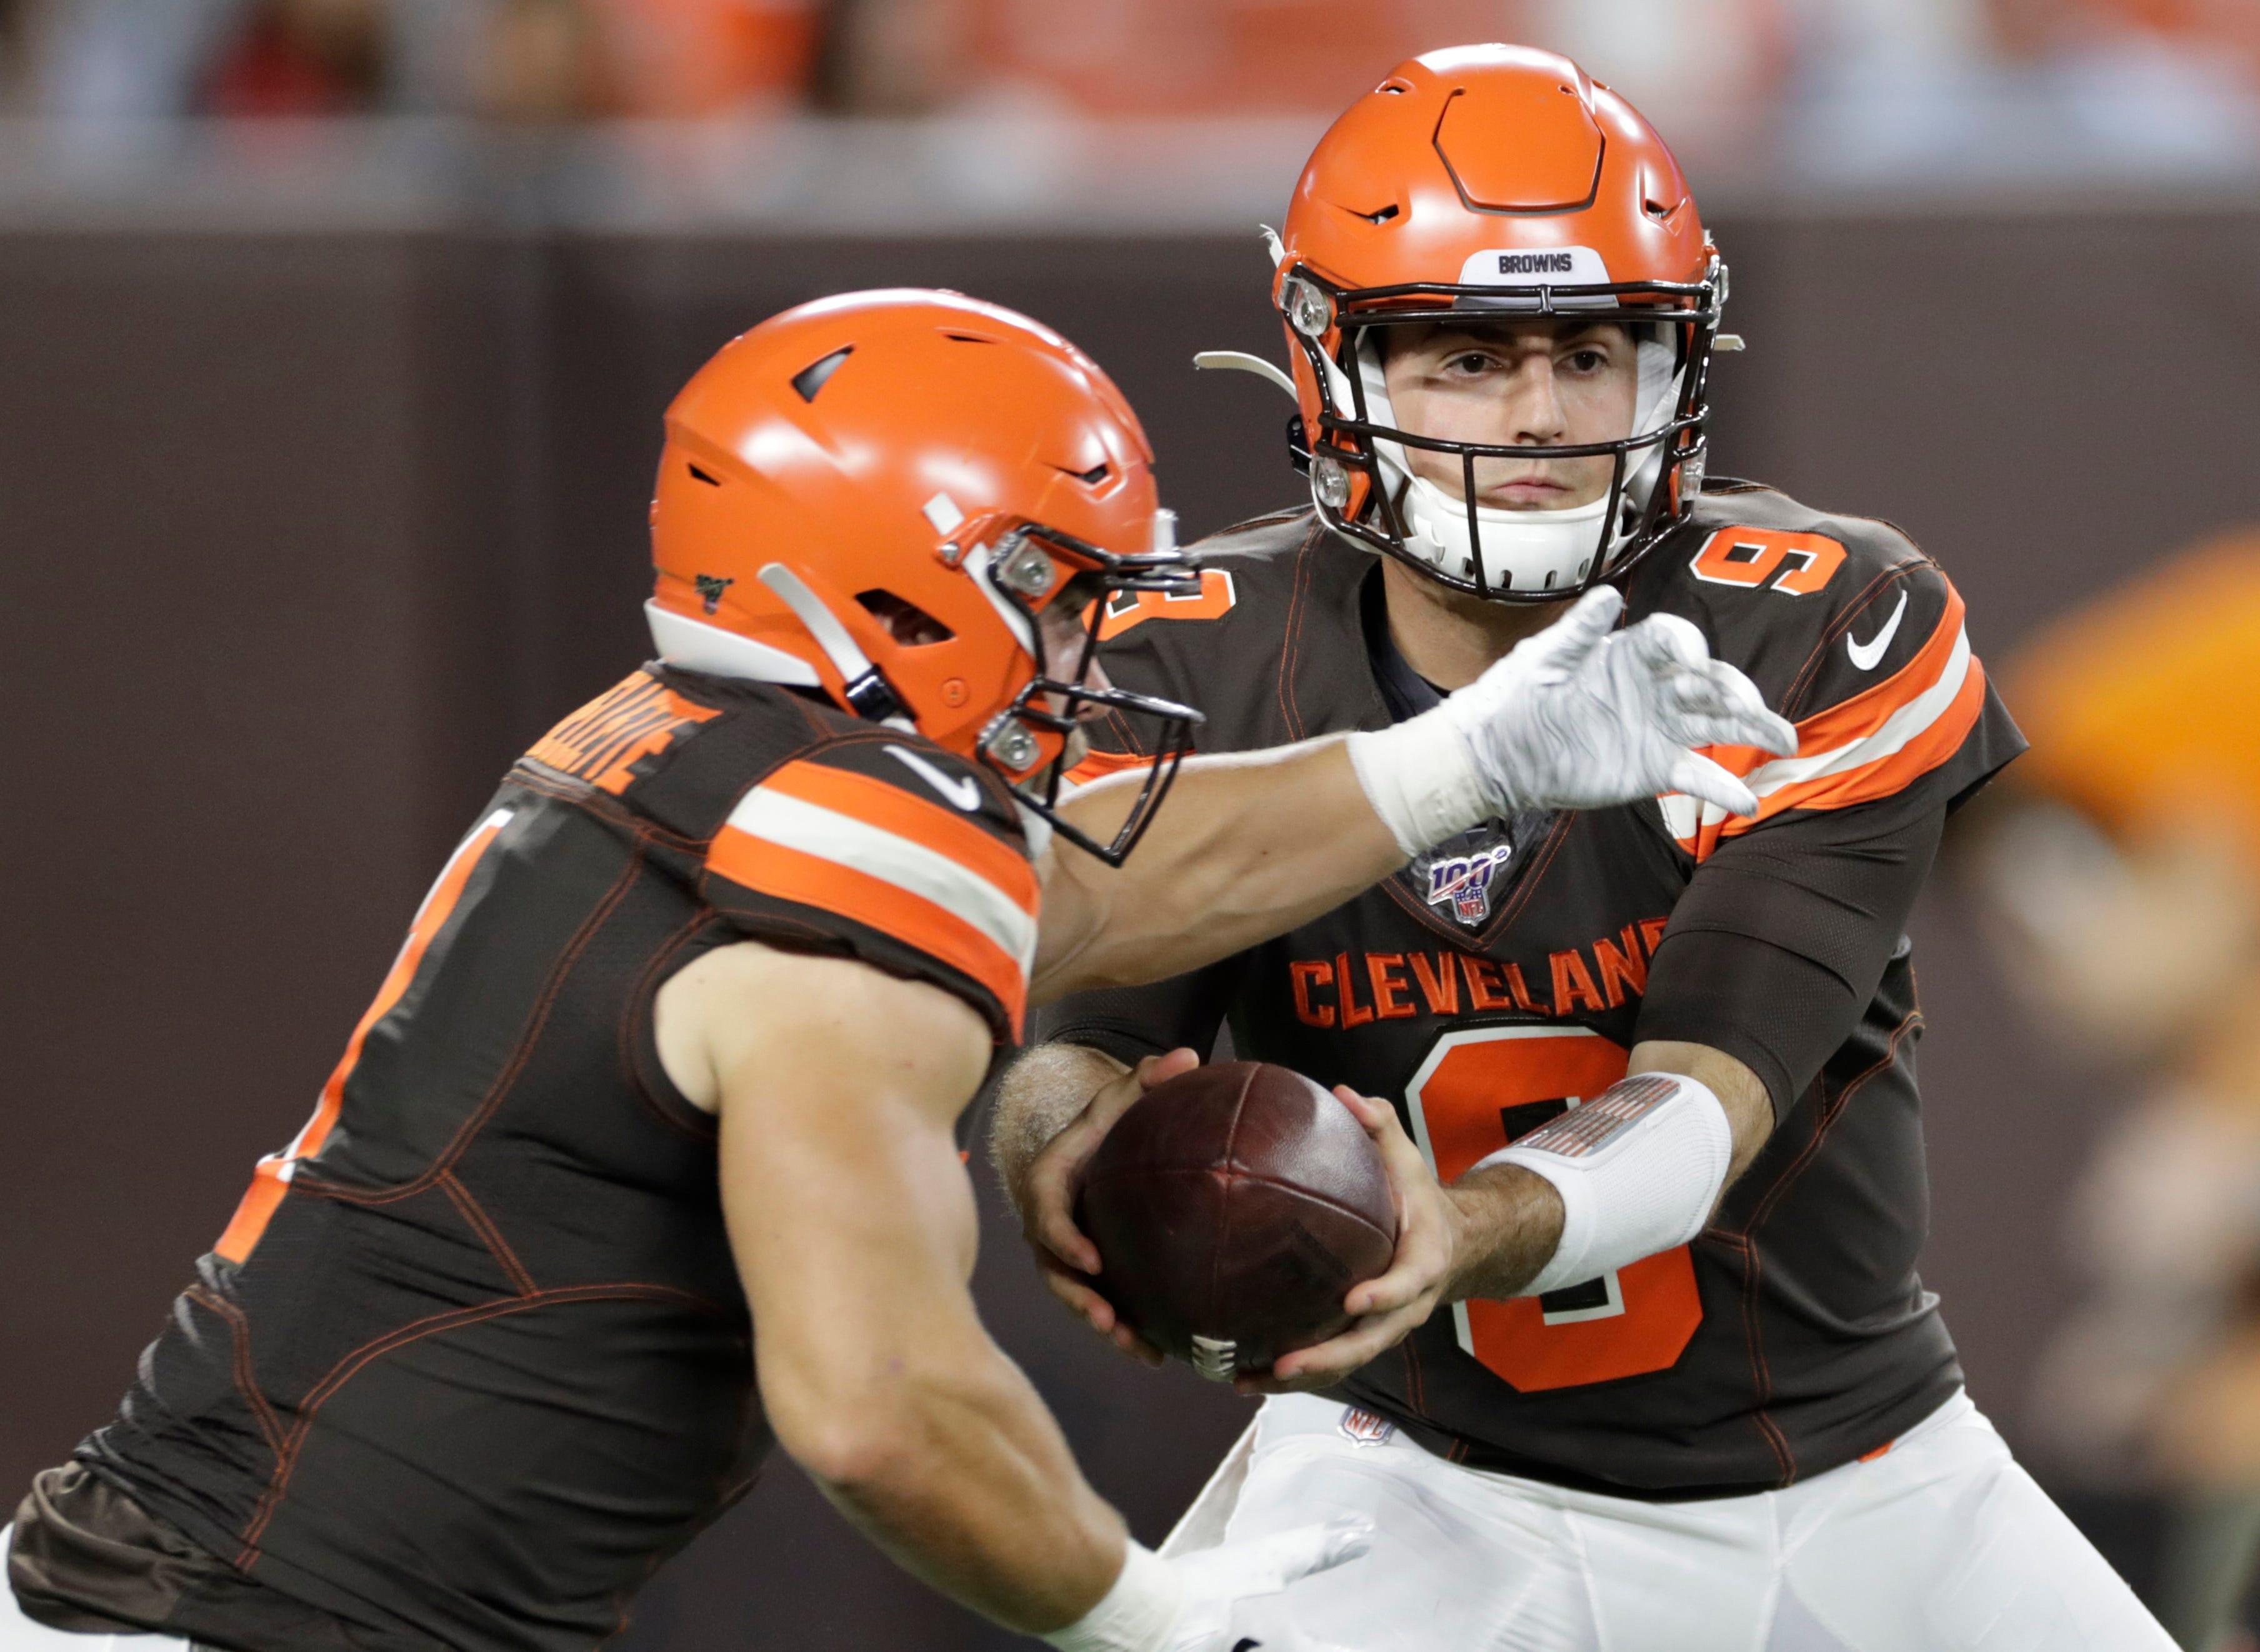 Browns deal rookie QB Blough to Lions, swap '22 draft picks thumbnail